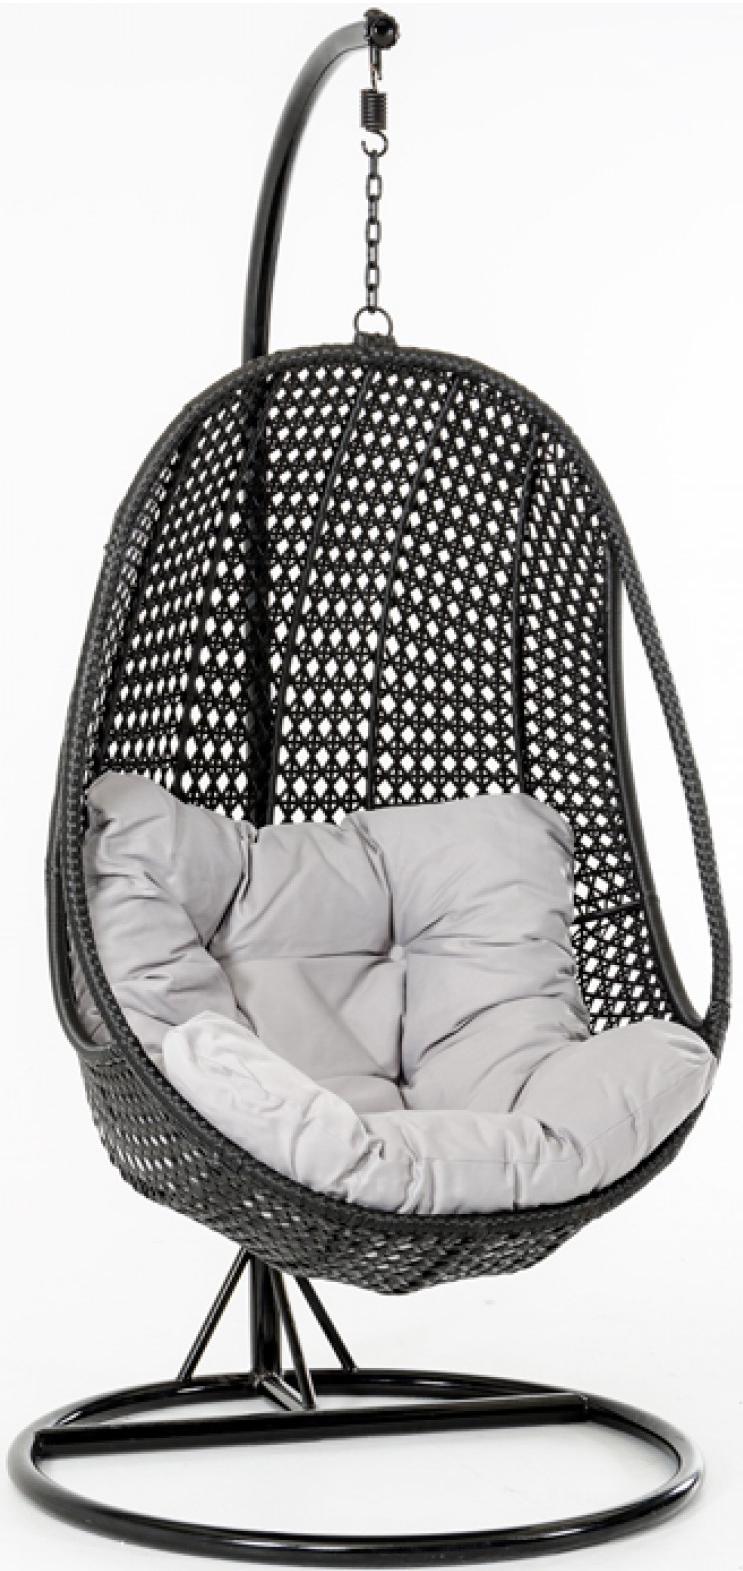 ... discount rattan pod hanging chair  sc 1 st  Advanced Interior Designs & Sardinia Rattan Pod Hanging Chair   Outdoor Patio Furniture